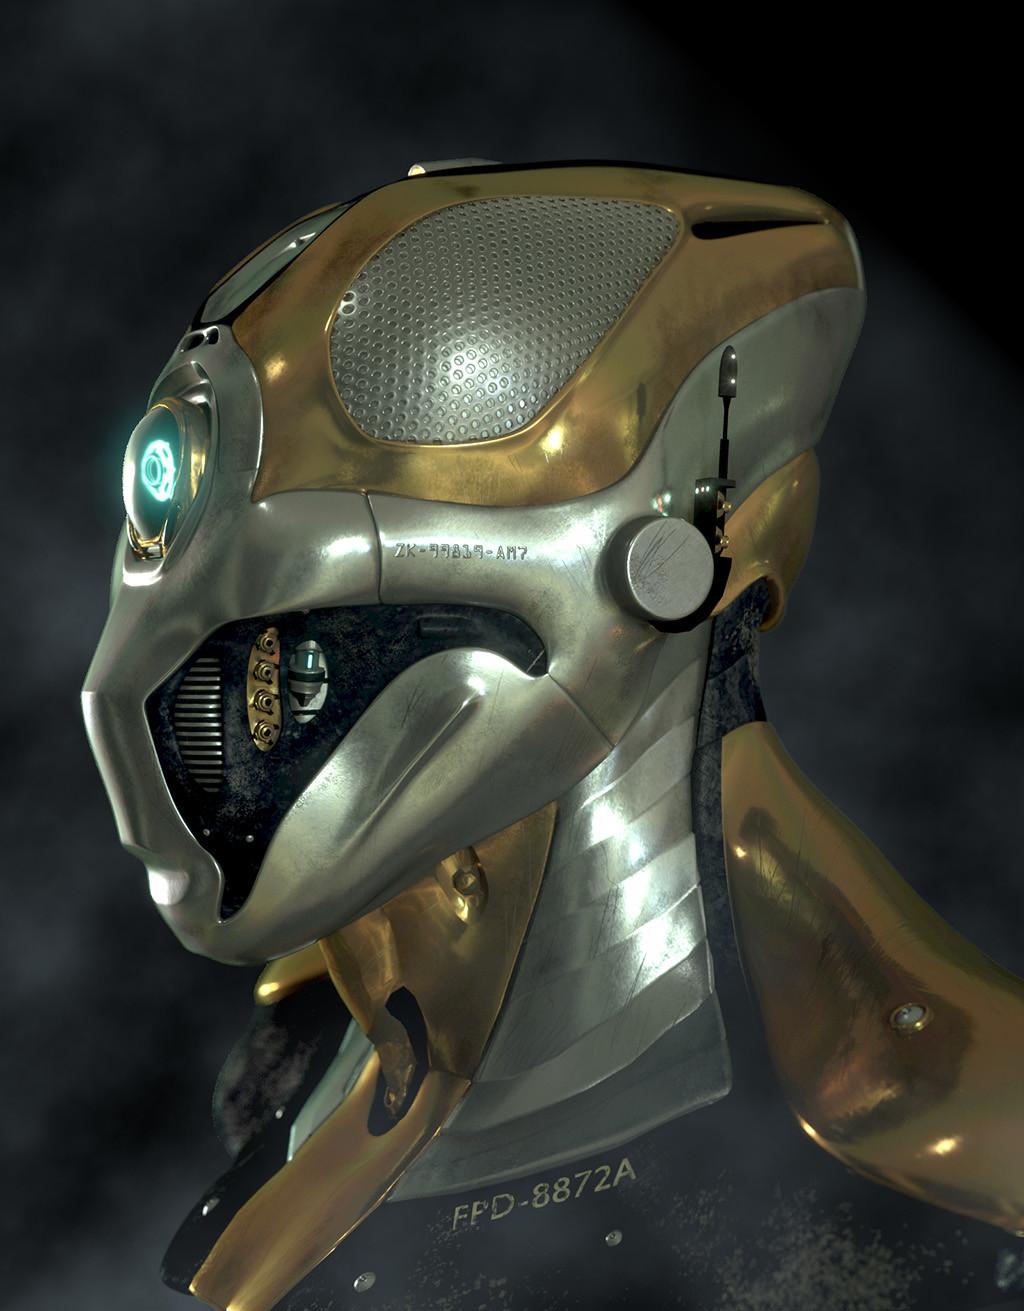 Final render using Octane for Maya